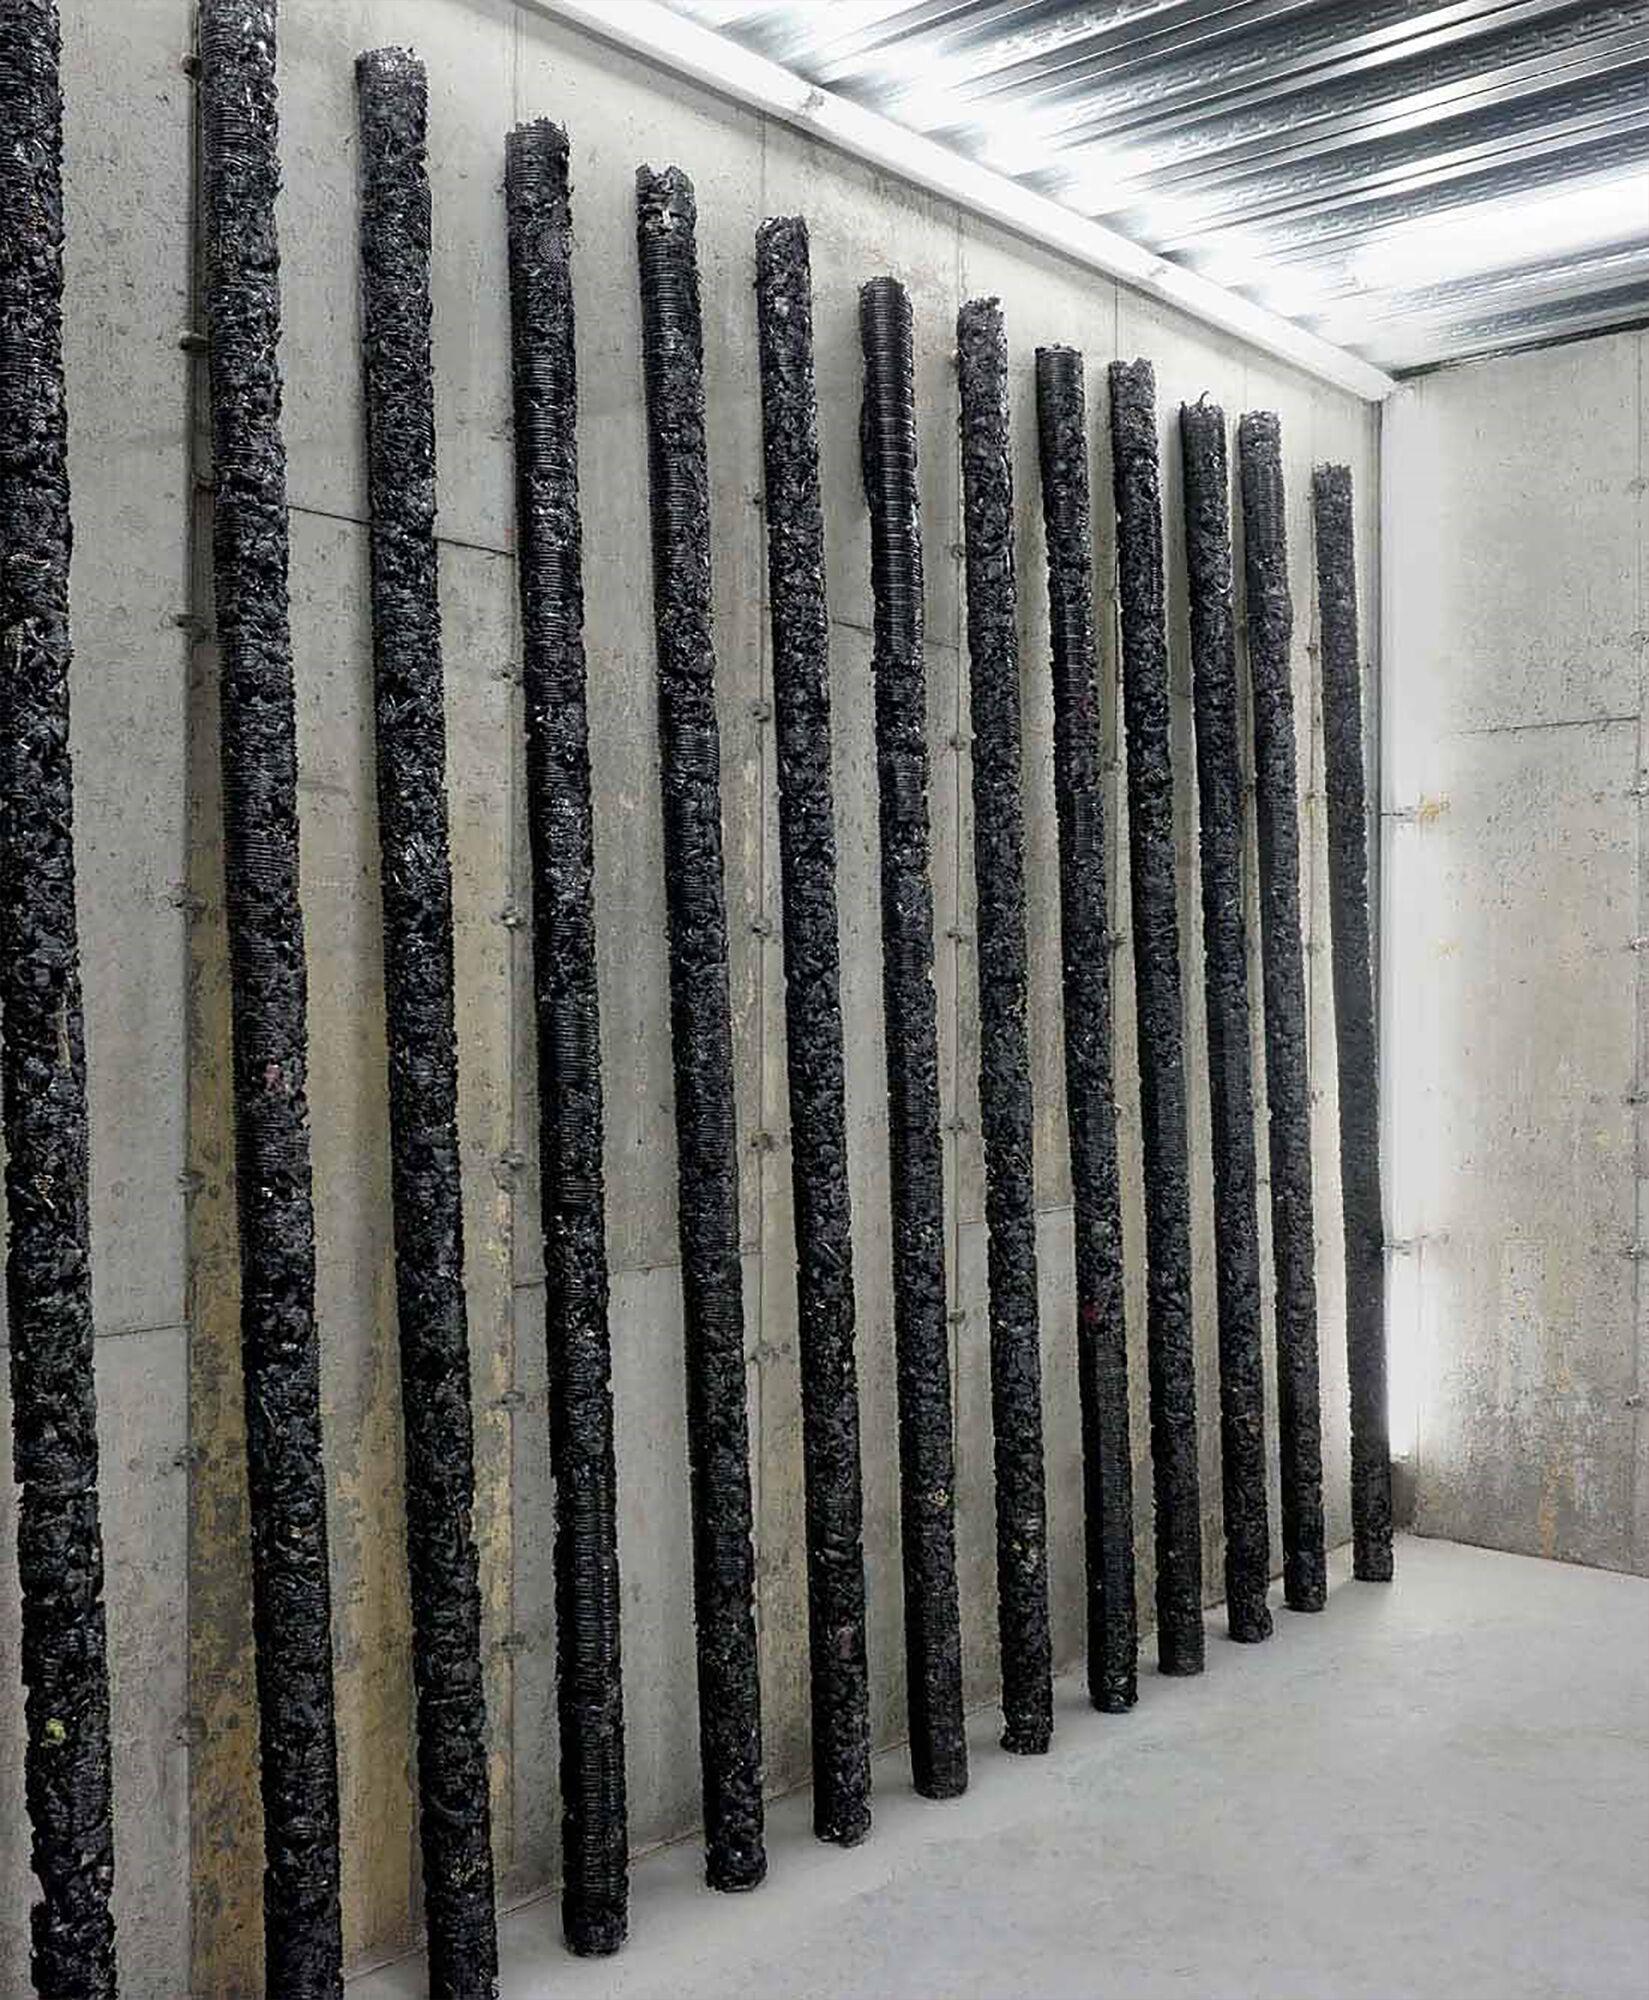 Инсталляция Helmut Lang x Anthony Vaccarello for Saint Laurent Rive Droite